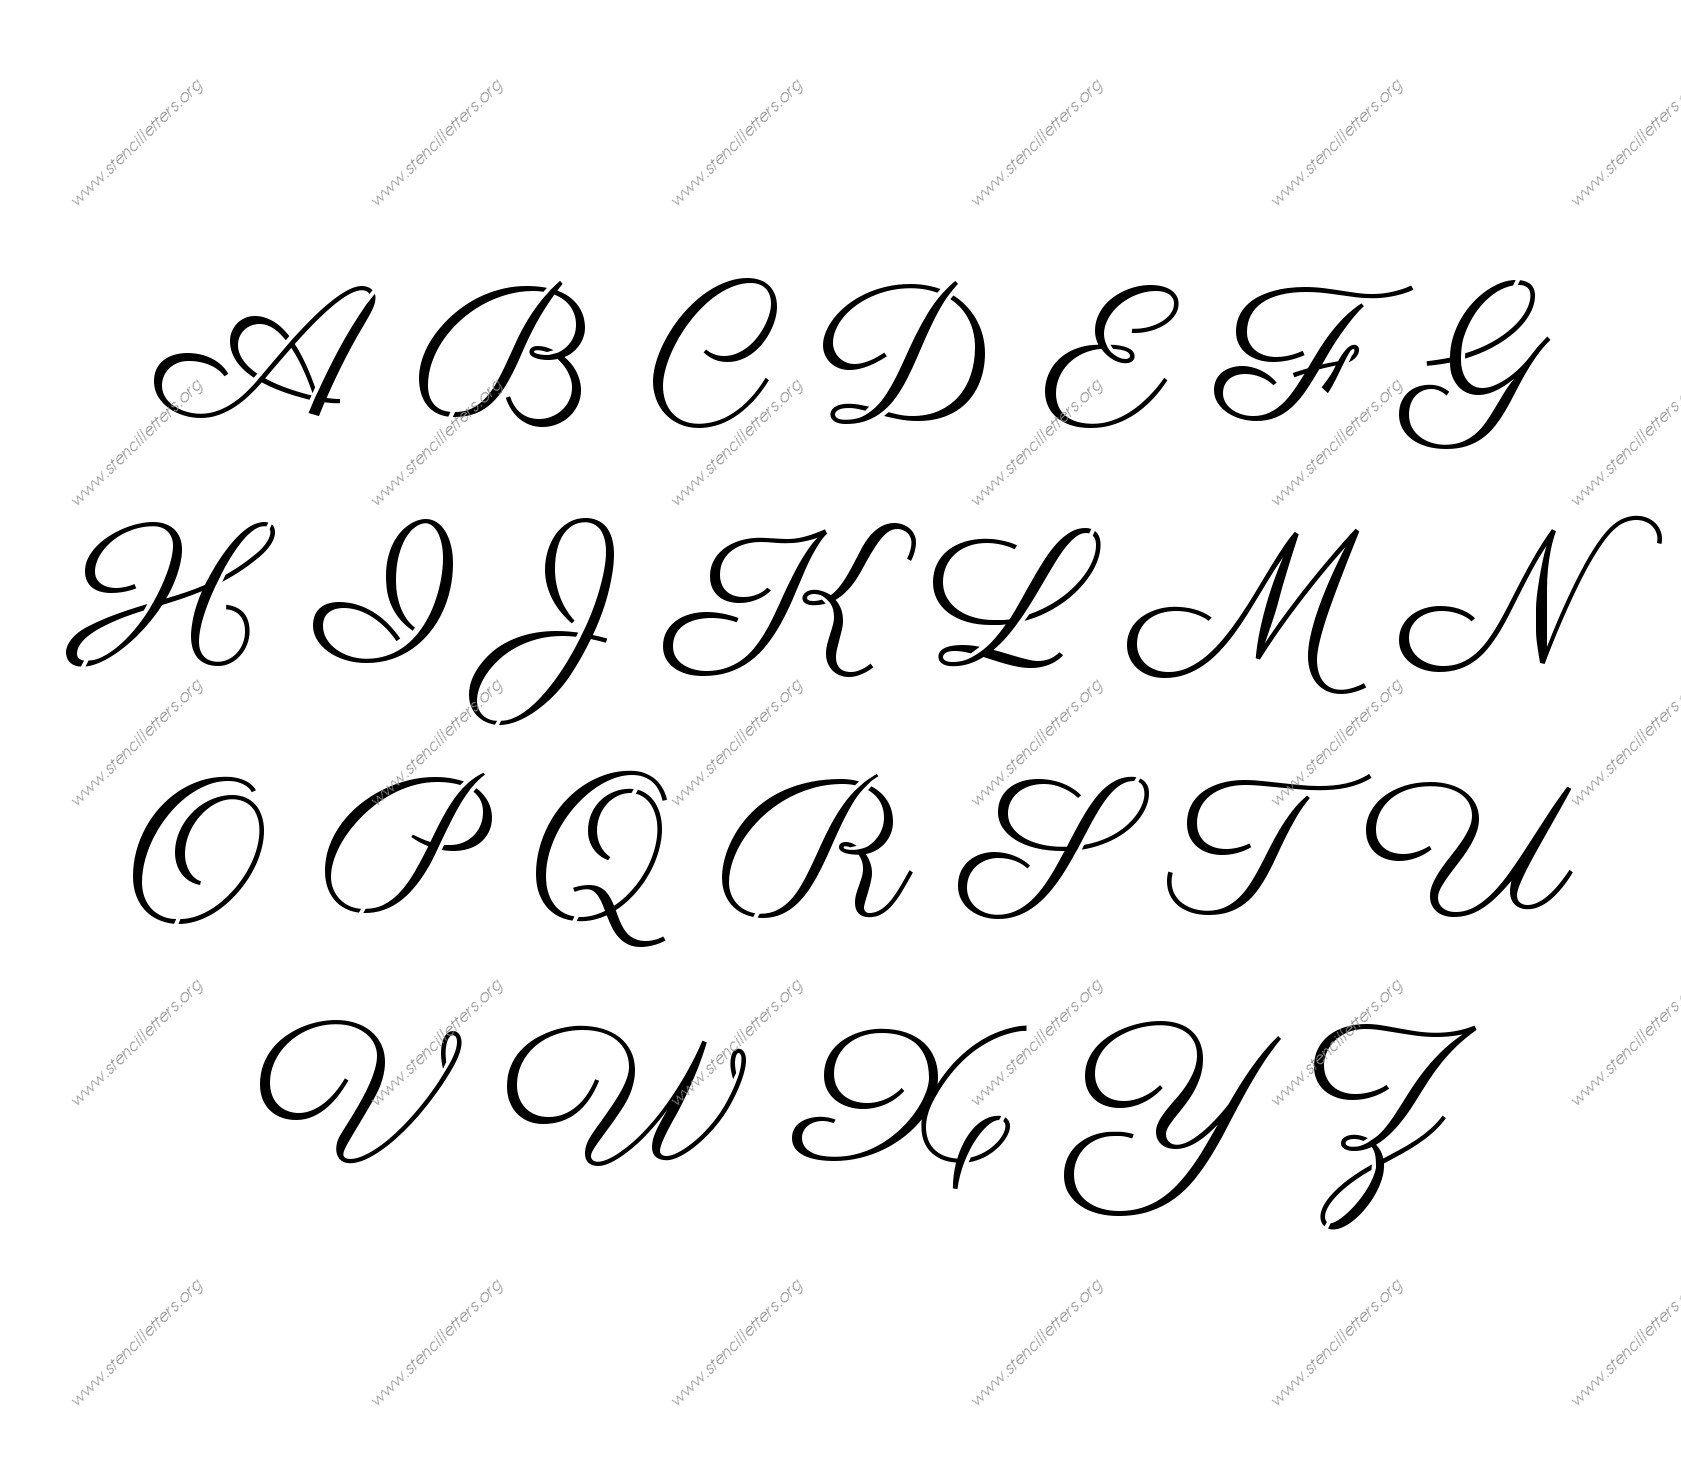 Free Printable Alphabet Stencil Letters Template   Art & Crafts - Free Printable Alphabet Templates